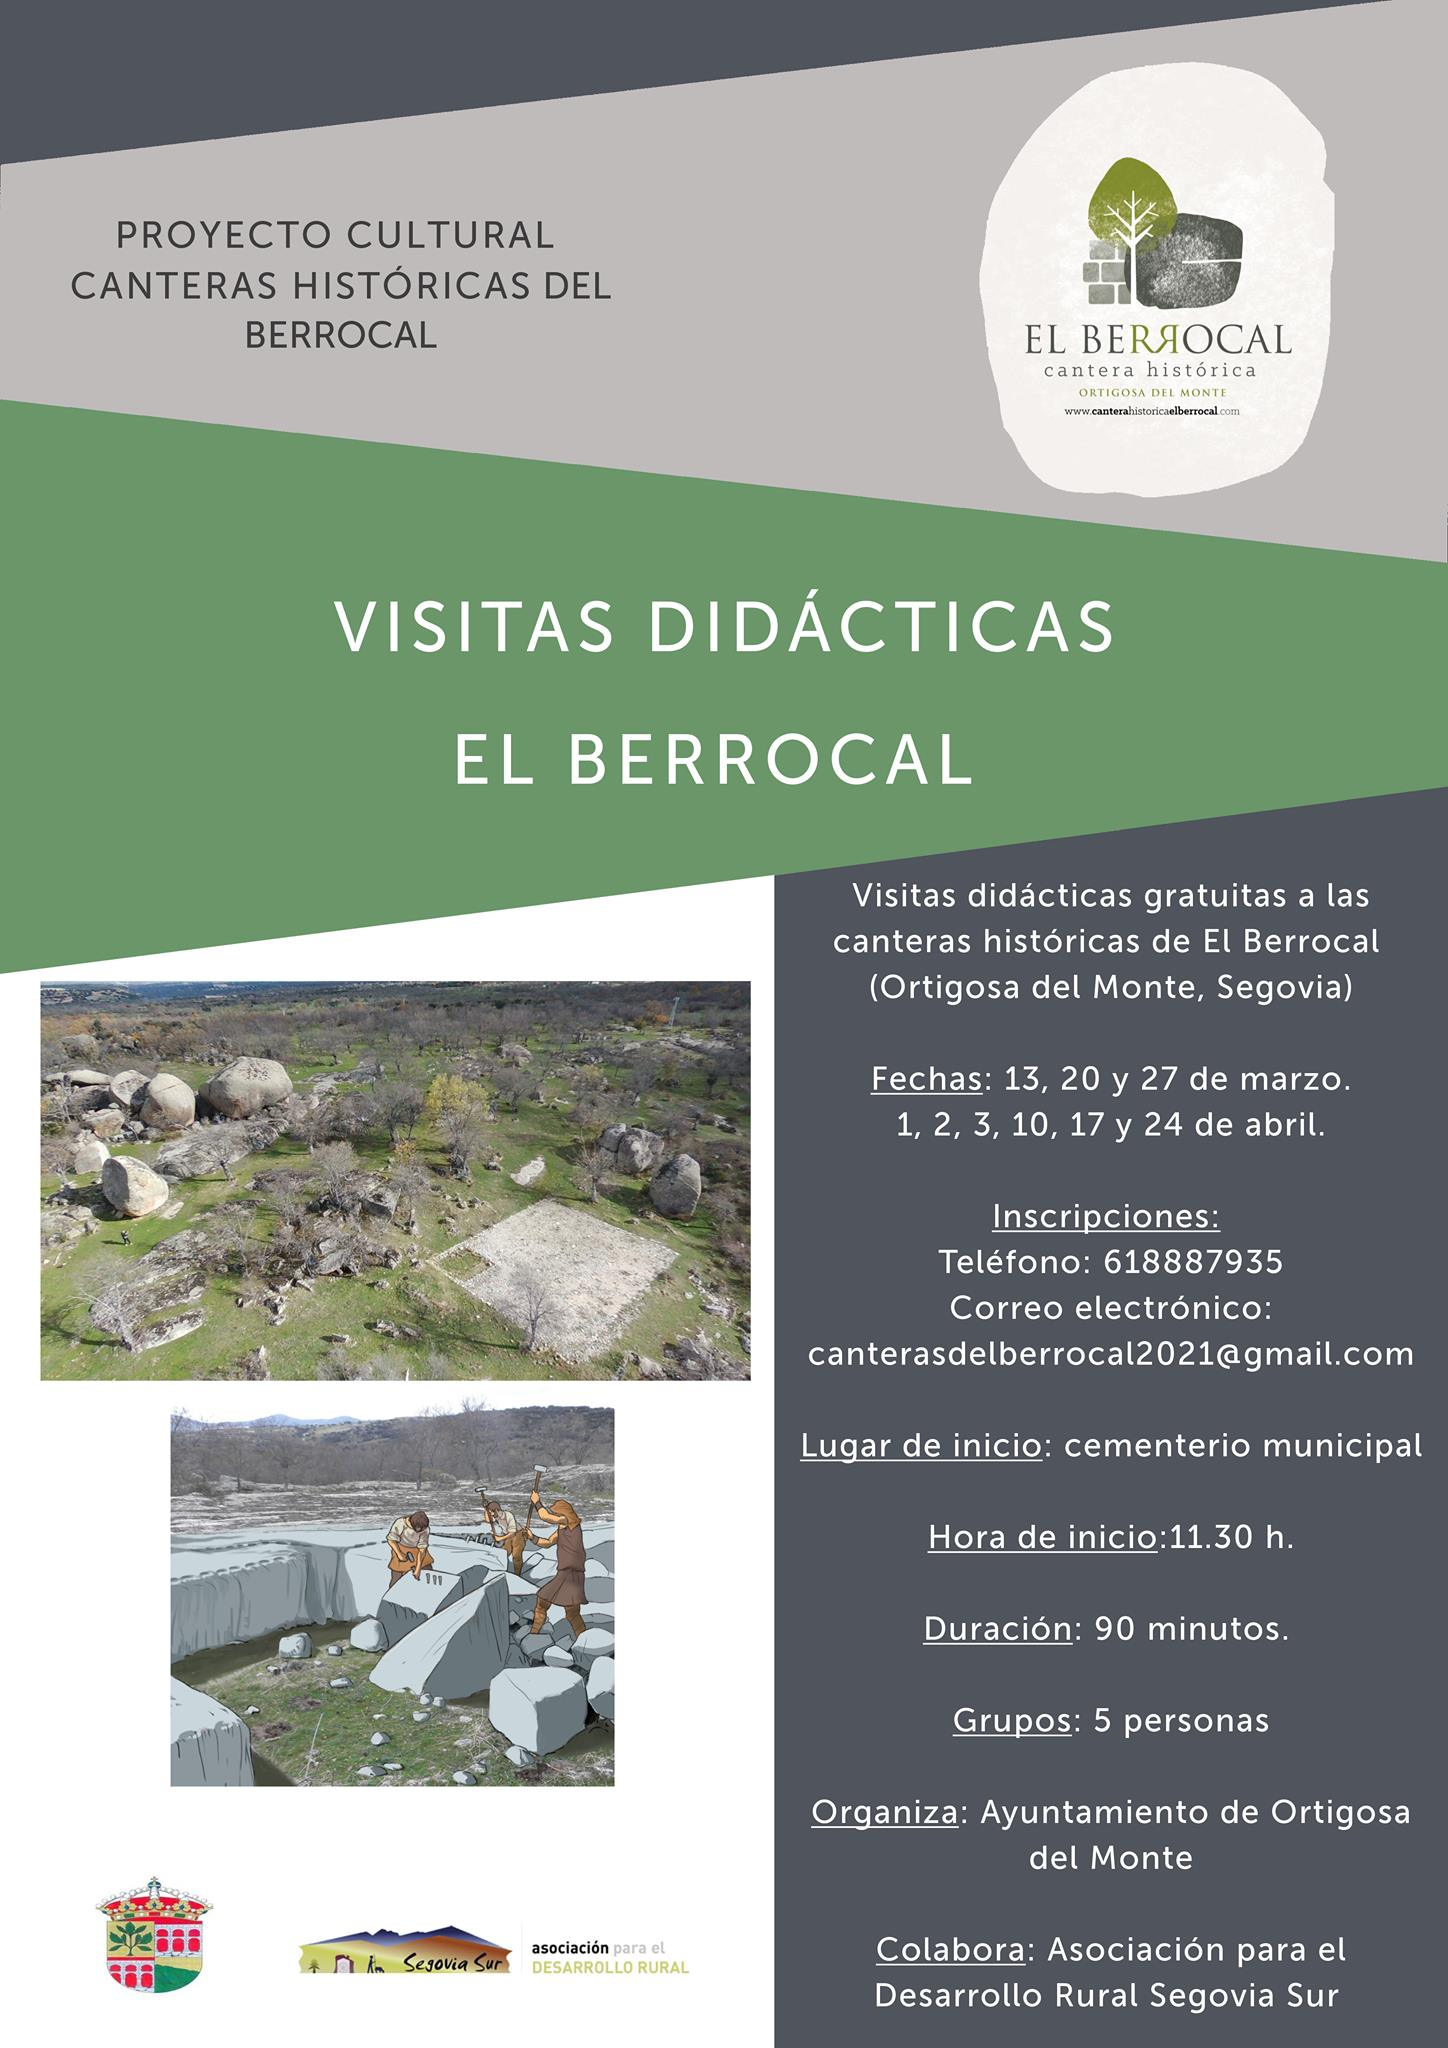 The Berrocal